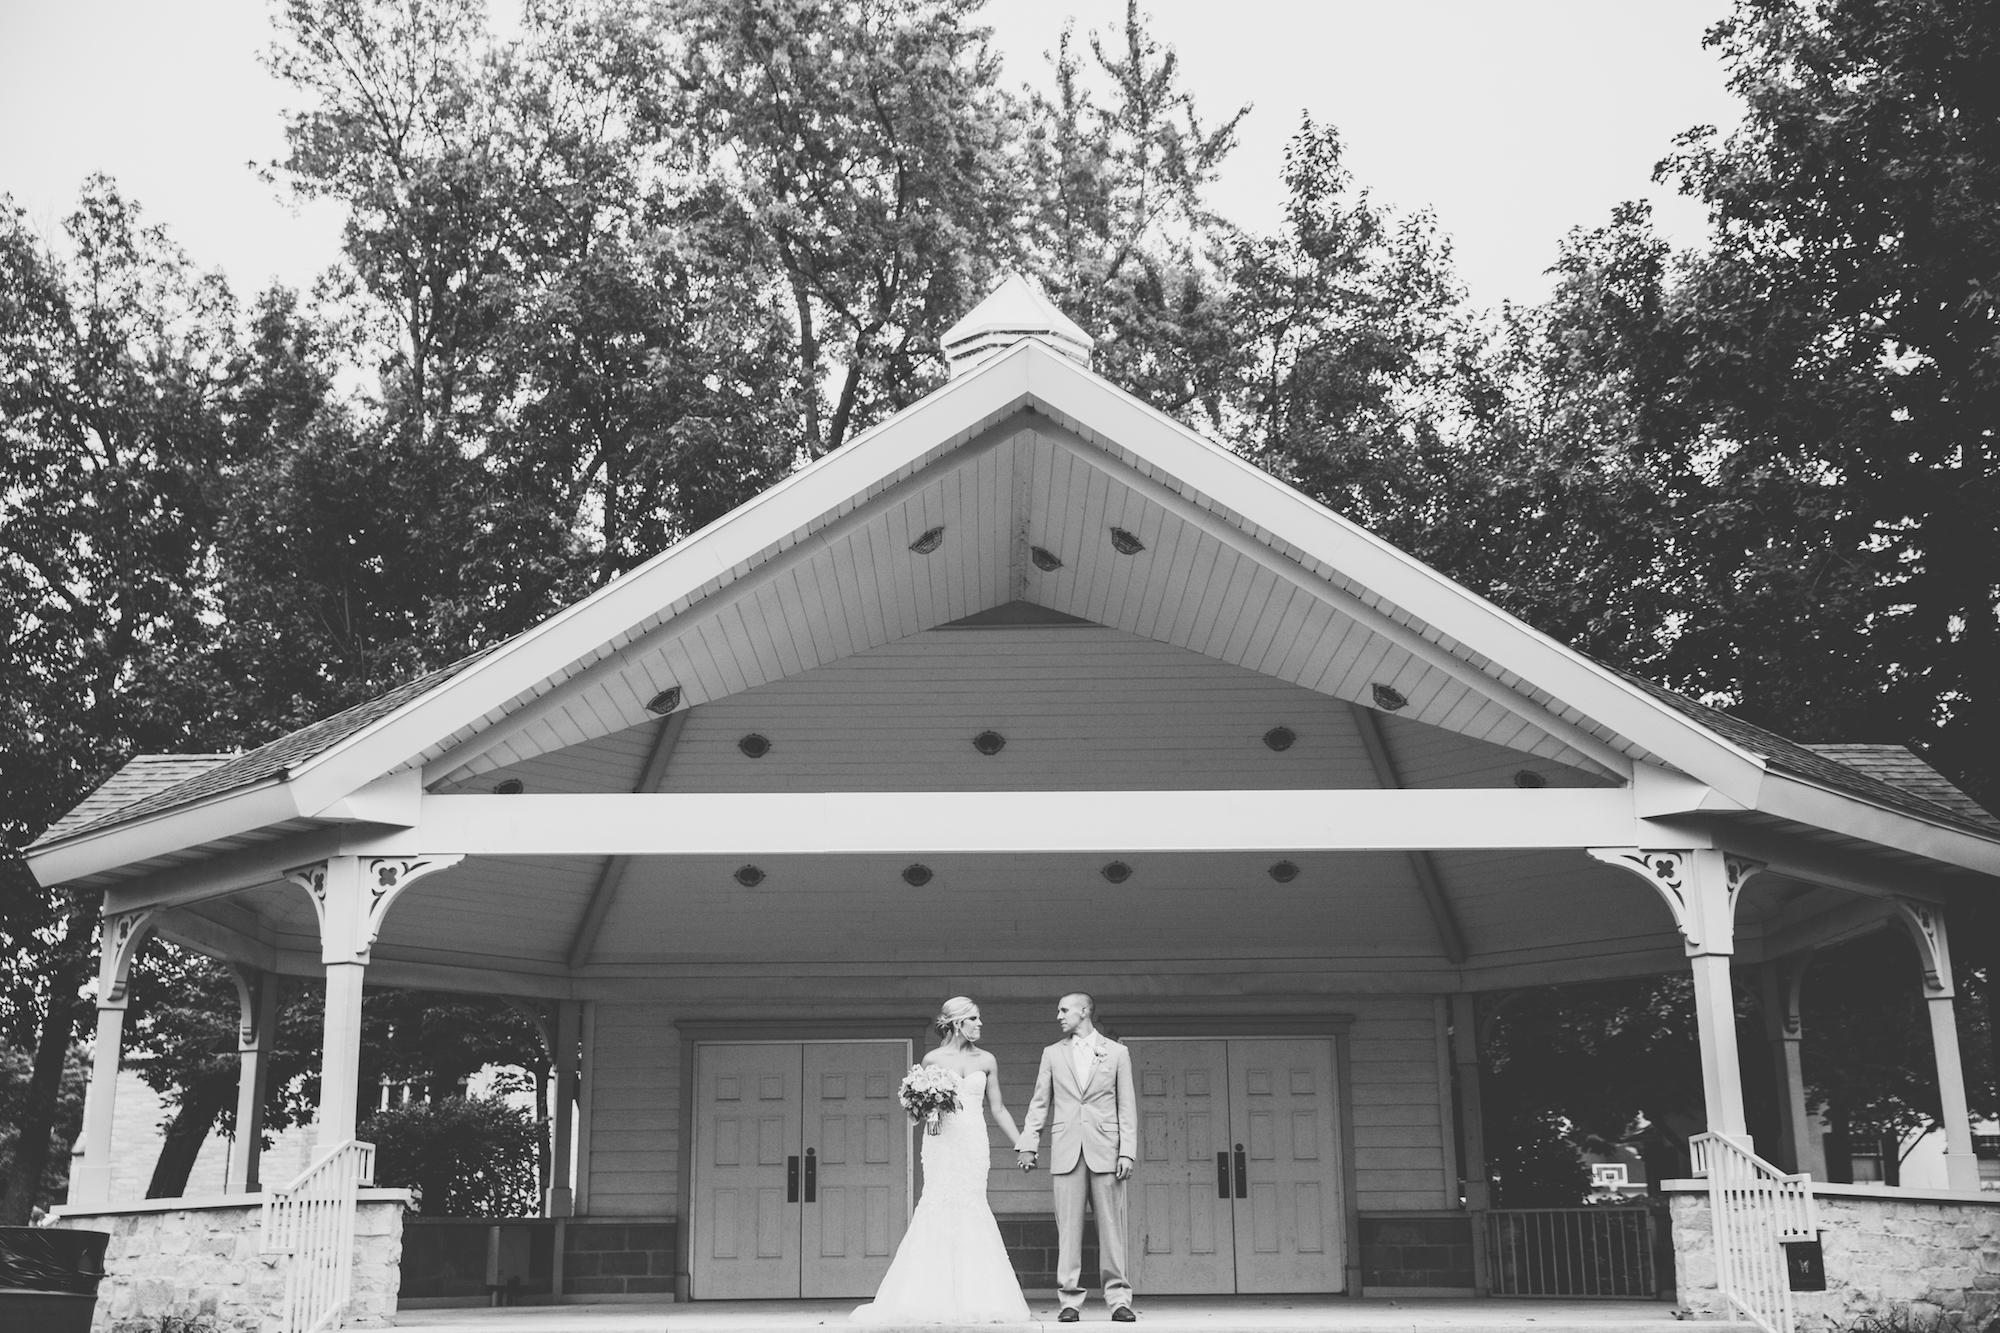 acowsay-cinema-minneapolis-wedding-21.jpg